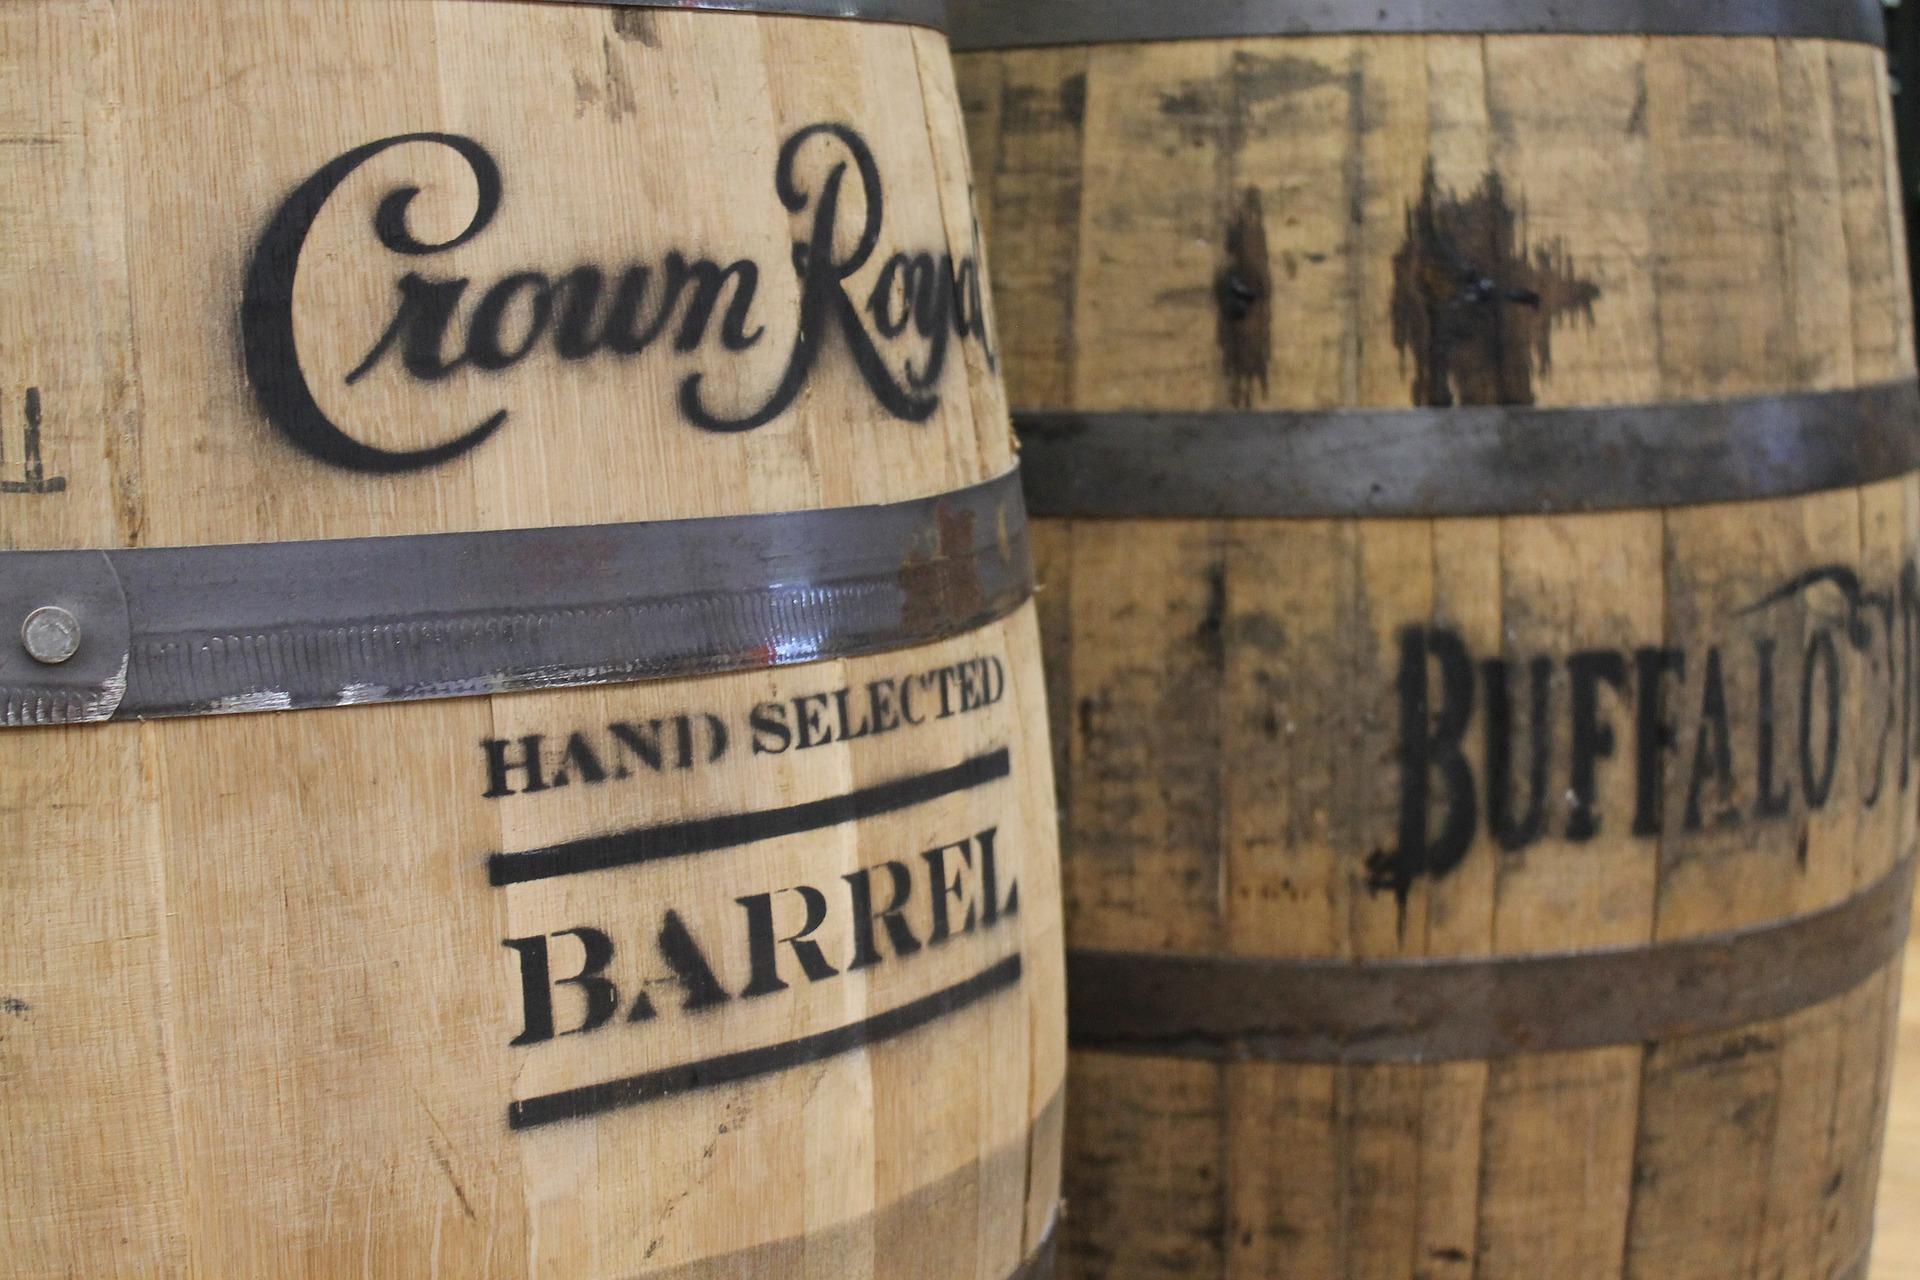 Crown Royal Whiskey